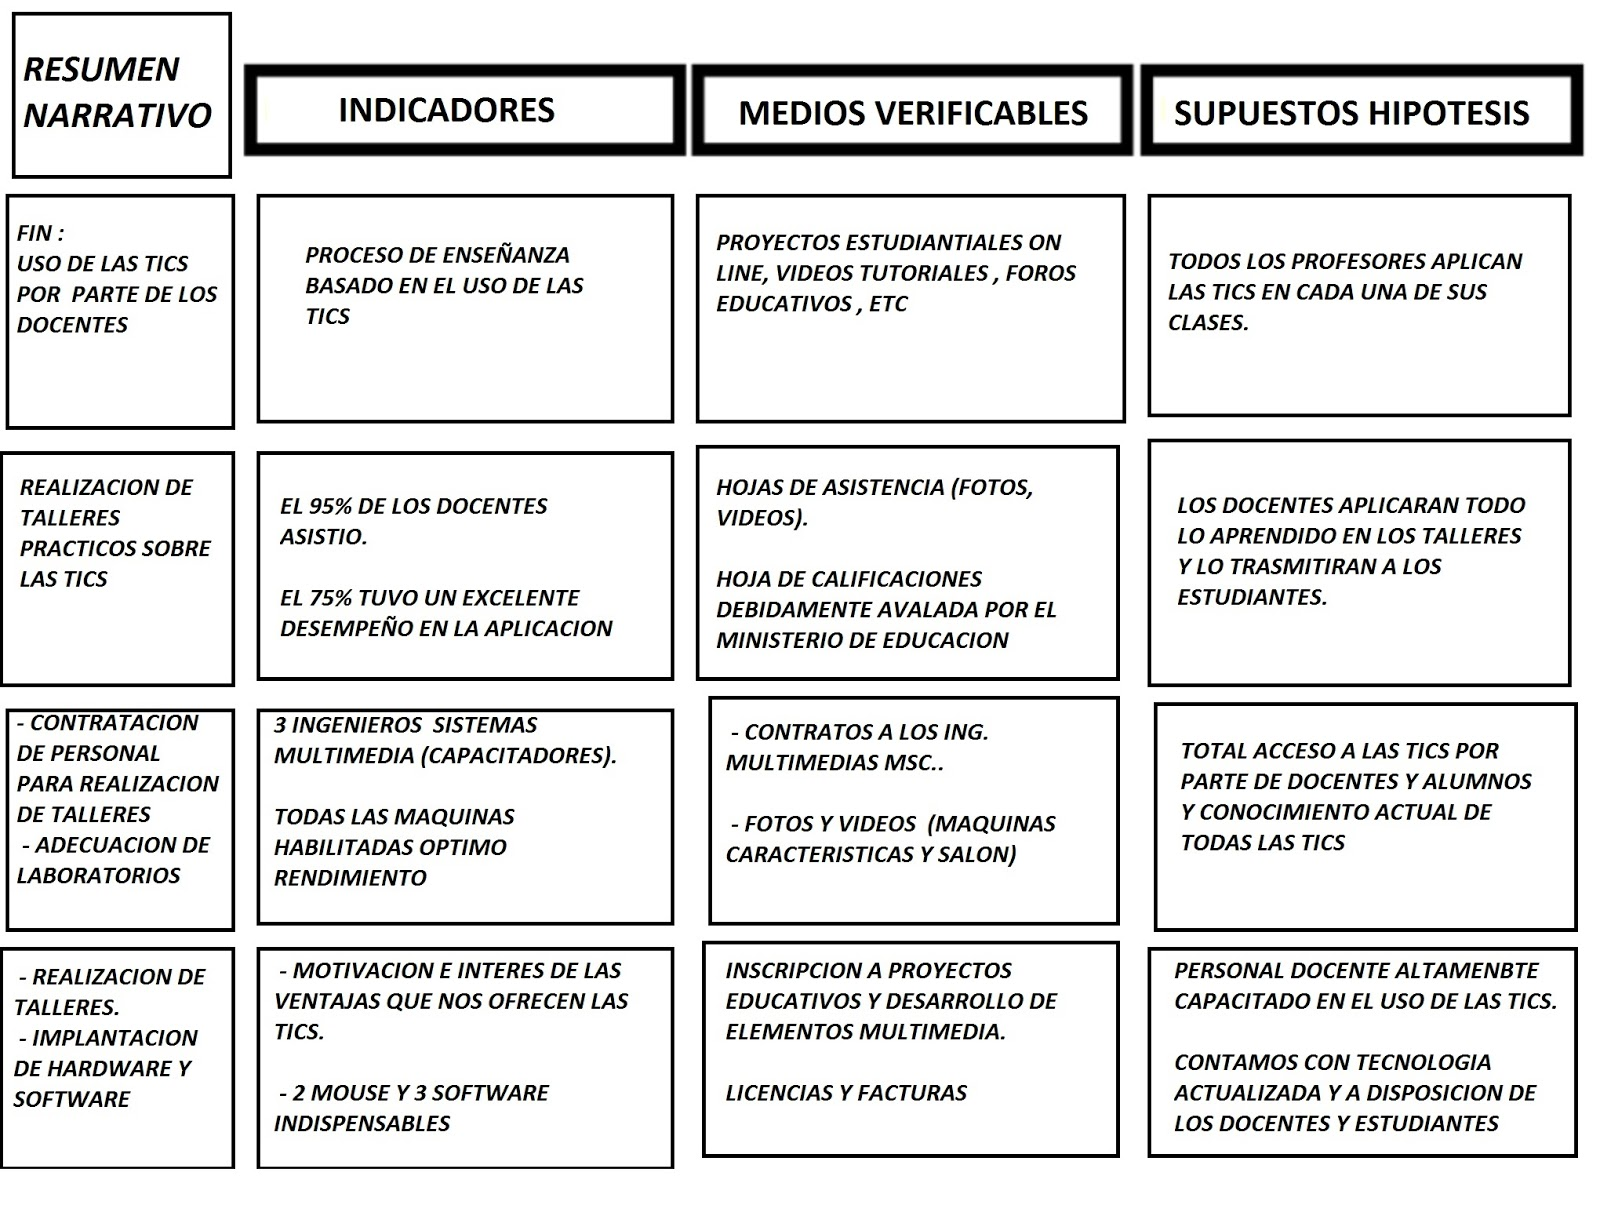 PROYECTO EDUCATIVO: REALIZACION DE UN MARCO LOGICO 3era PARTE